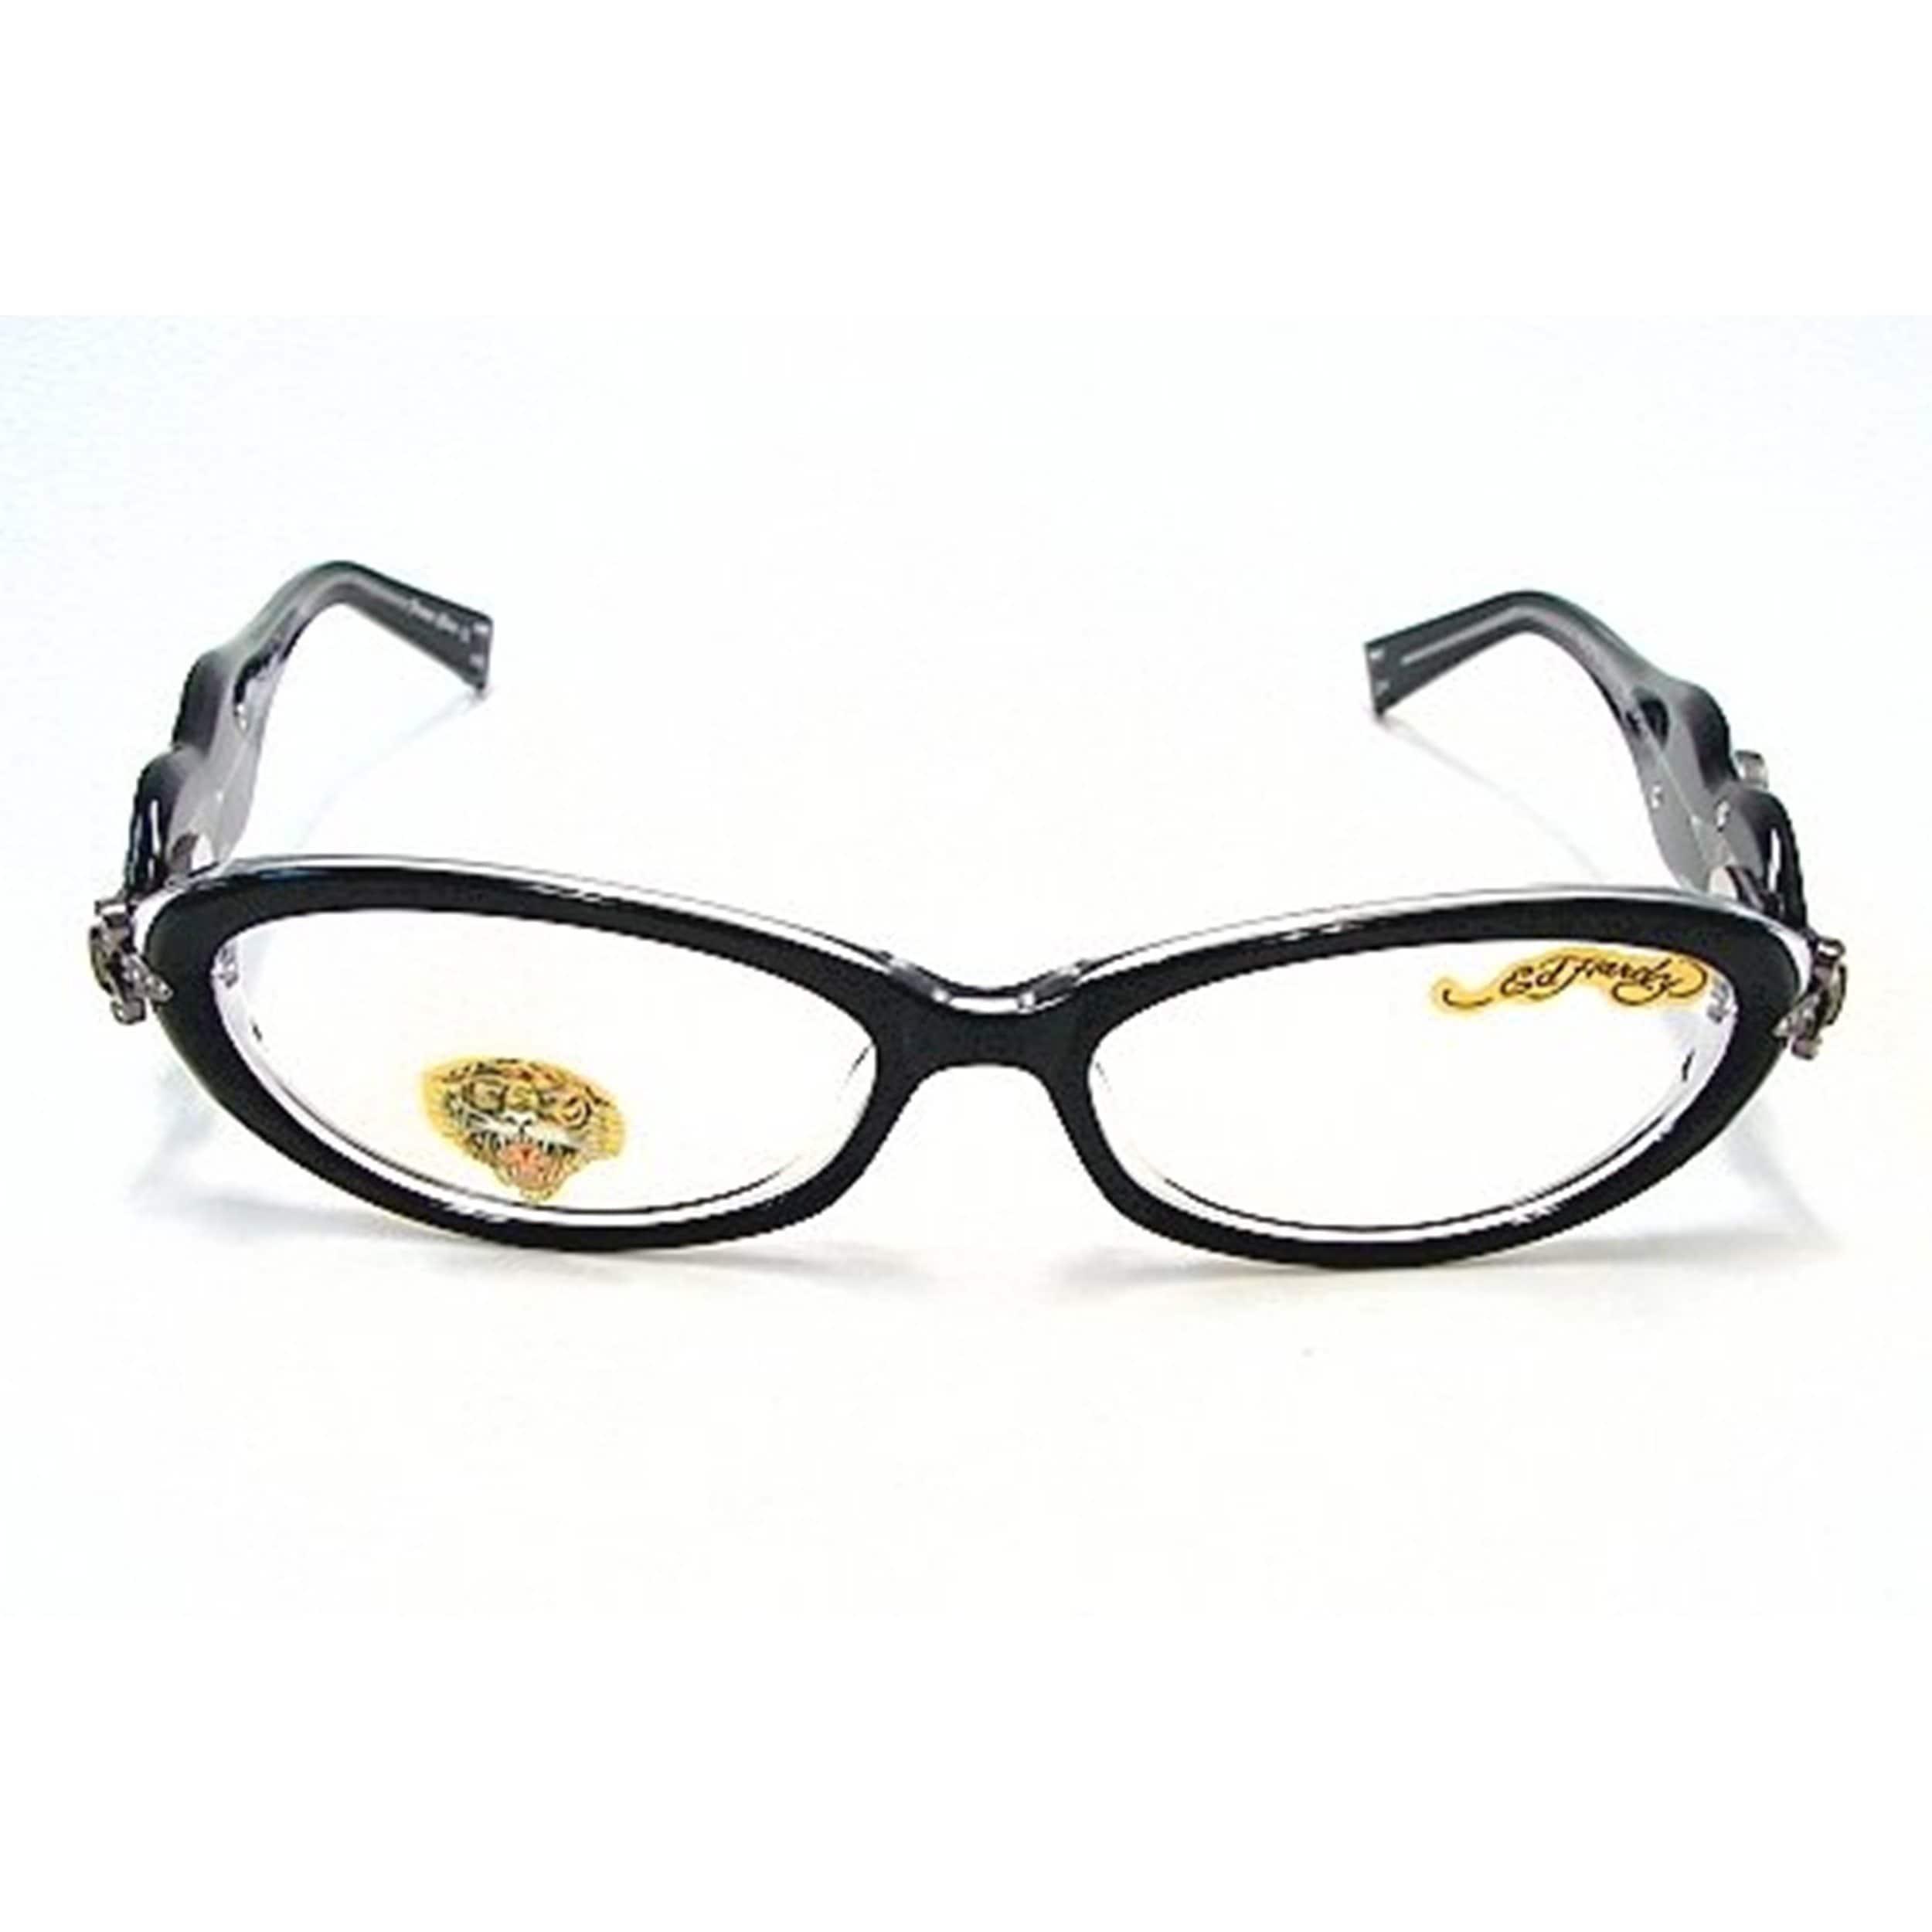 37eeb1f5bc Shop Ed Hardy Women s EHO-709 Black   Crystal Designer Eyeglasses - Free  Shipping Today - Overstock - 11801495